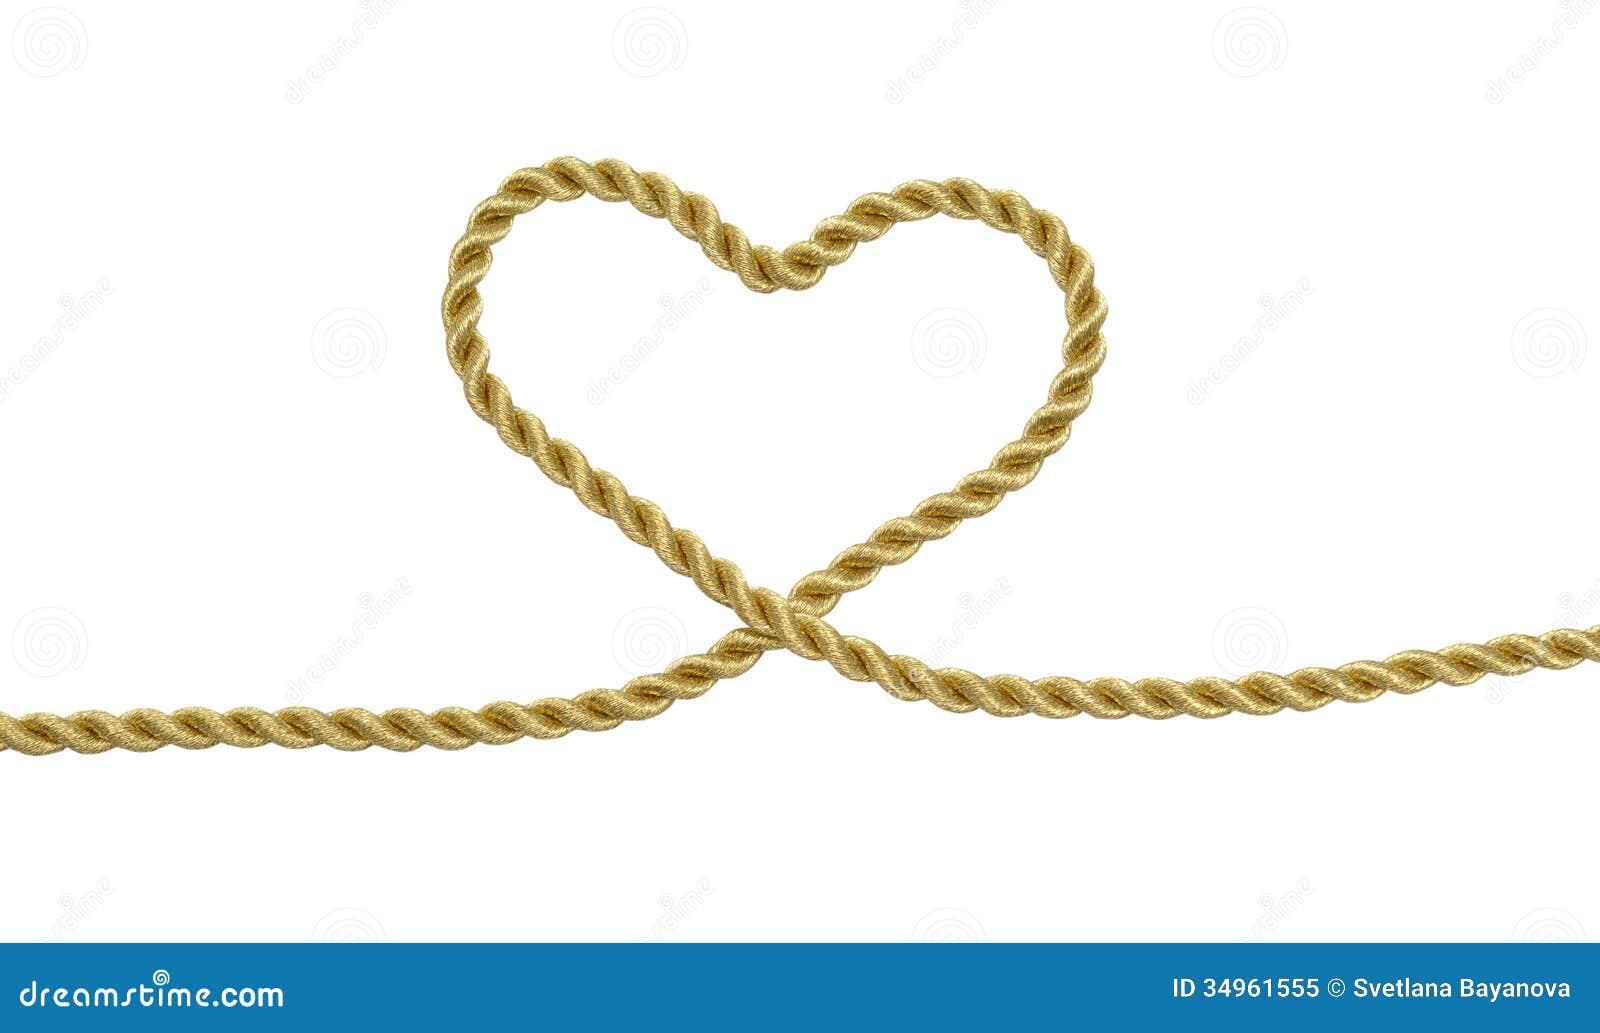 Heart Royalty Free Stock Photo Image 34961555